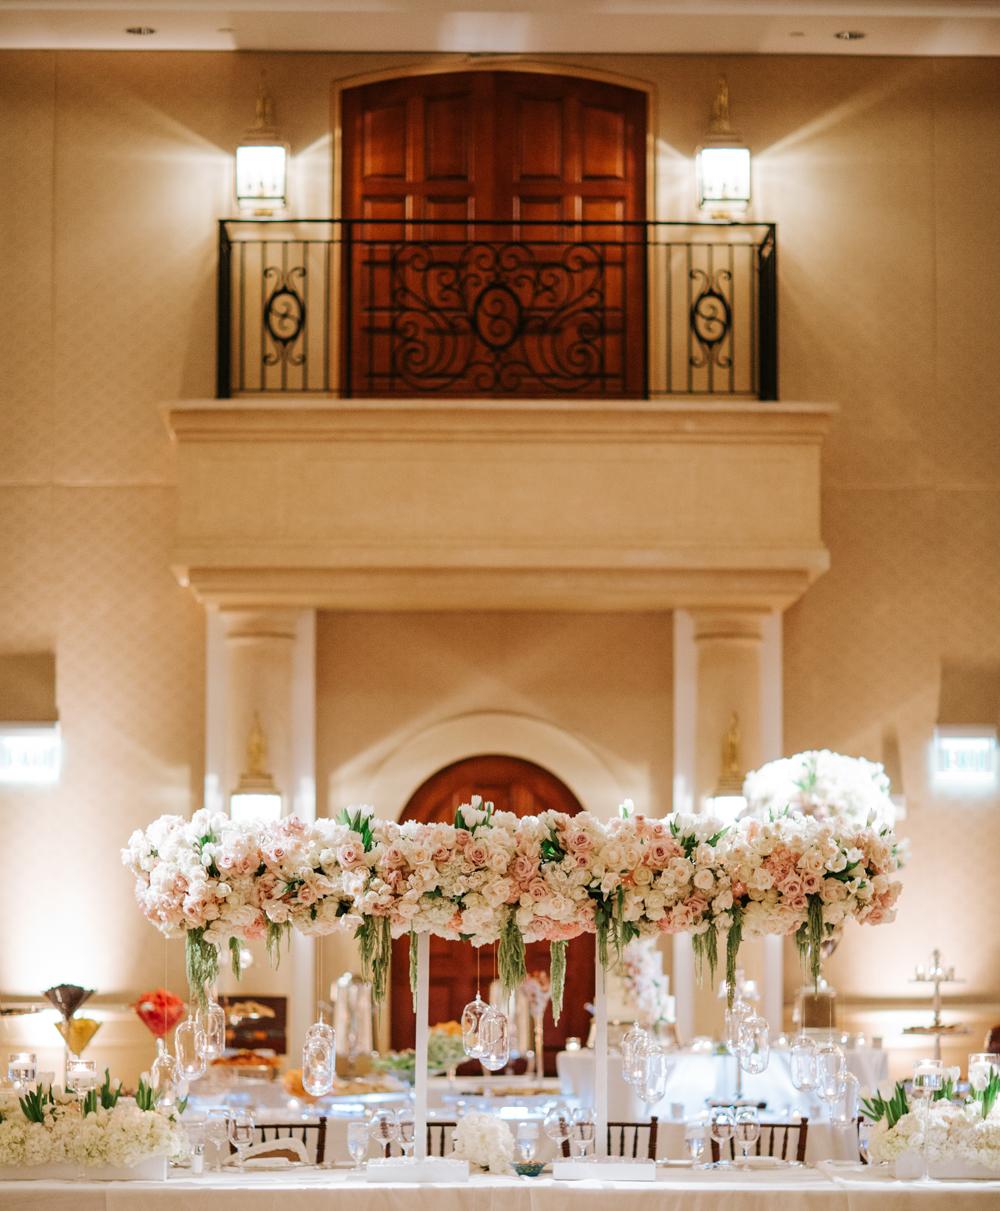 24 The Ritz-Carlton Bacara, Santa Barbara.JPG